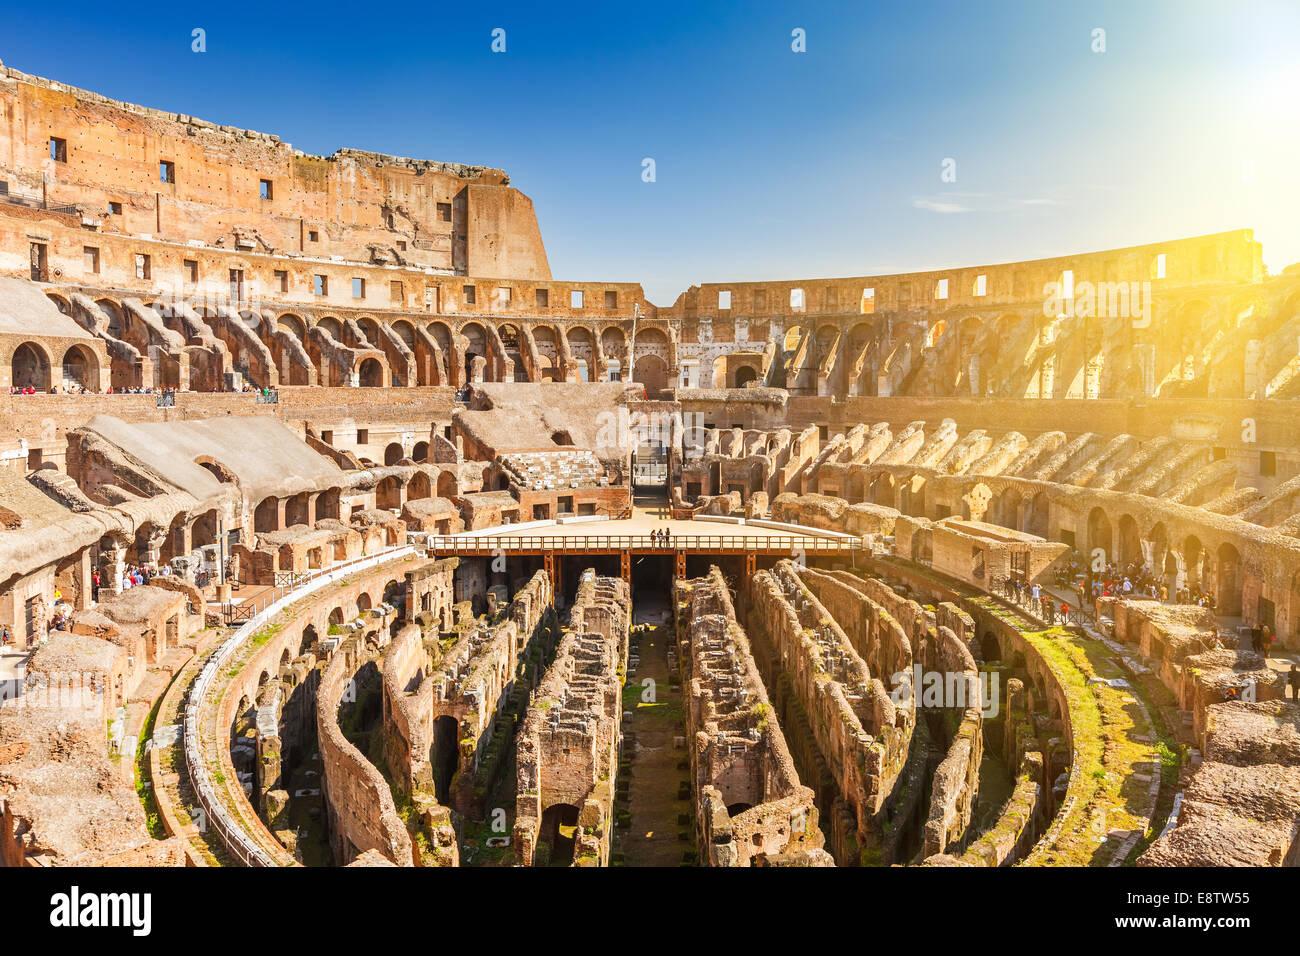 Coliseum in Rome - Stock Image